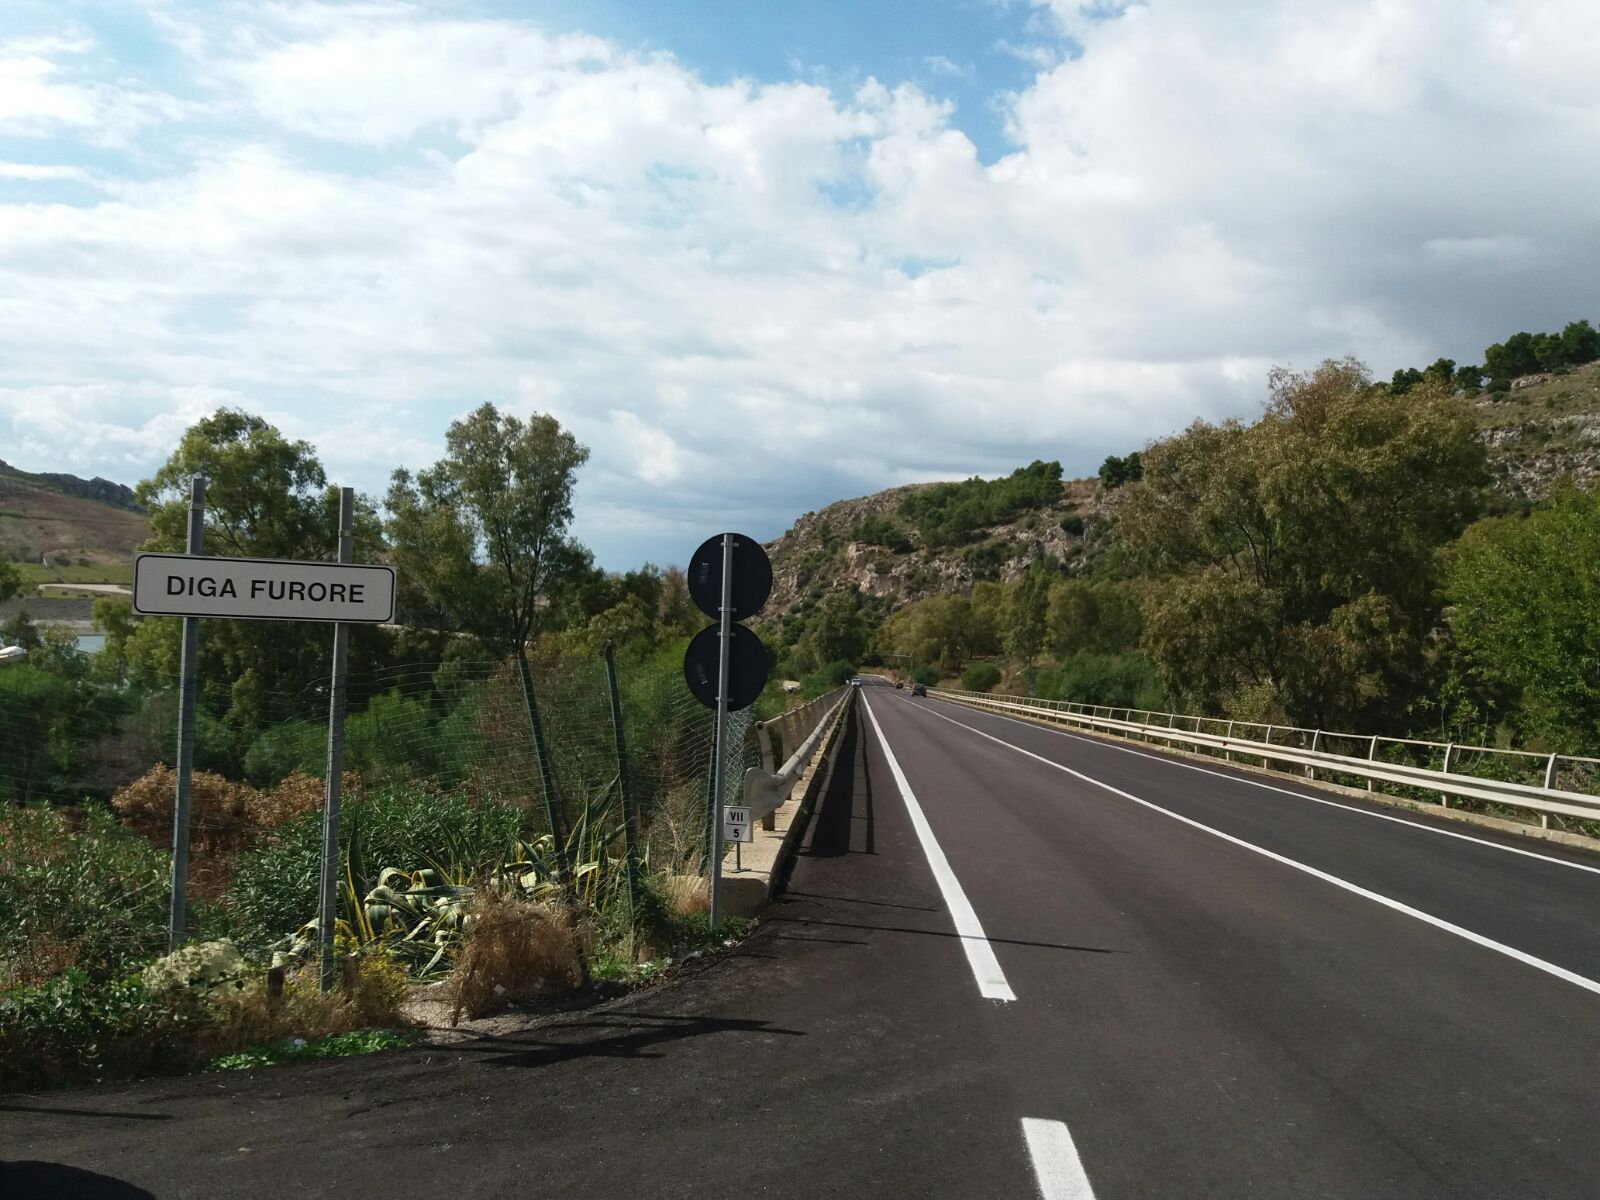 Incidente diga Furore: sarà lutto cittadino a Naro e Favara